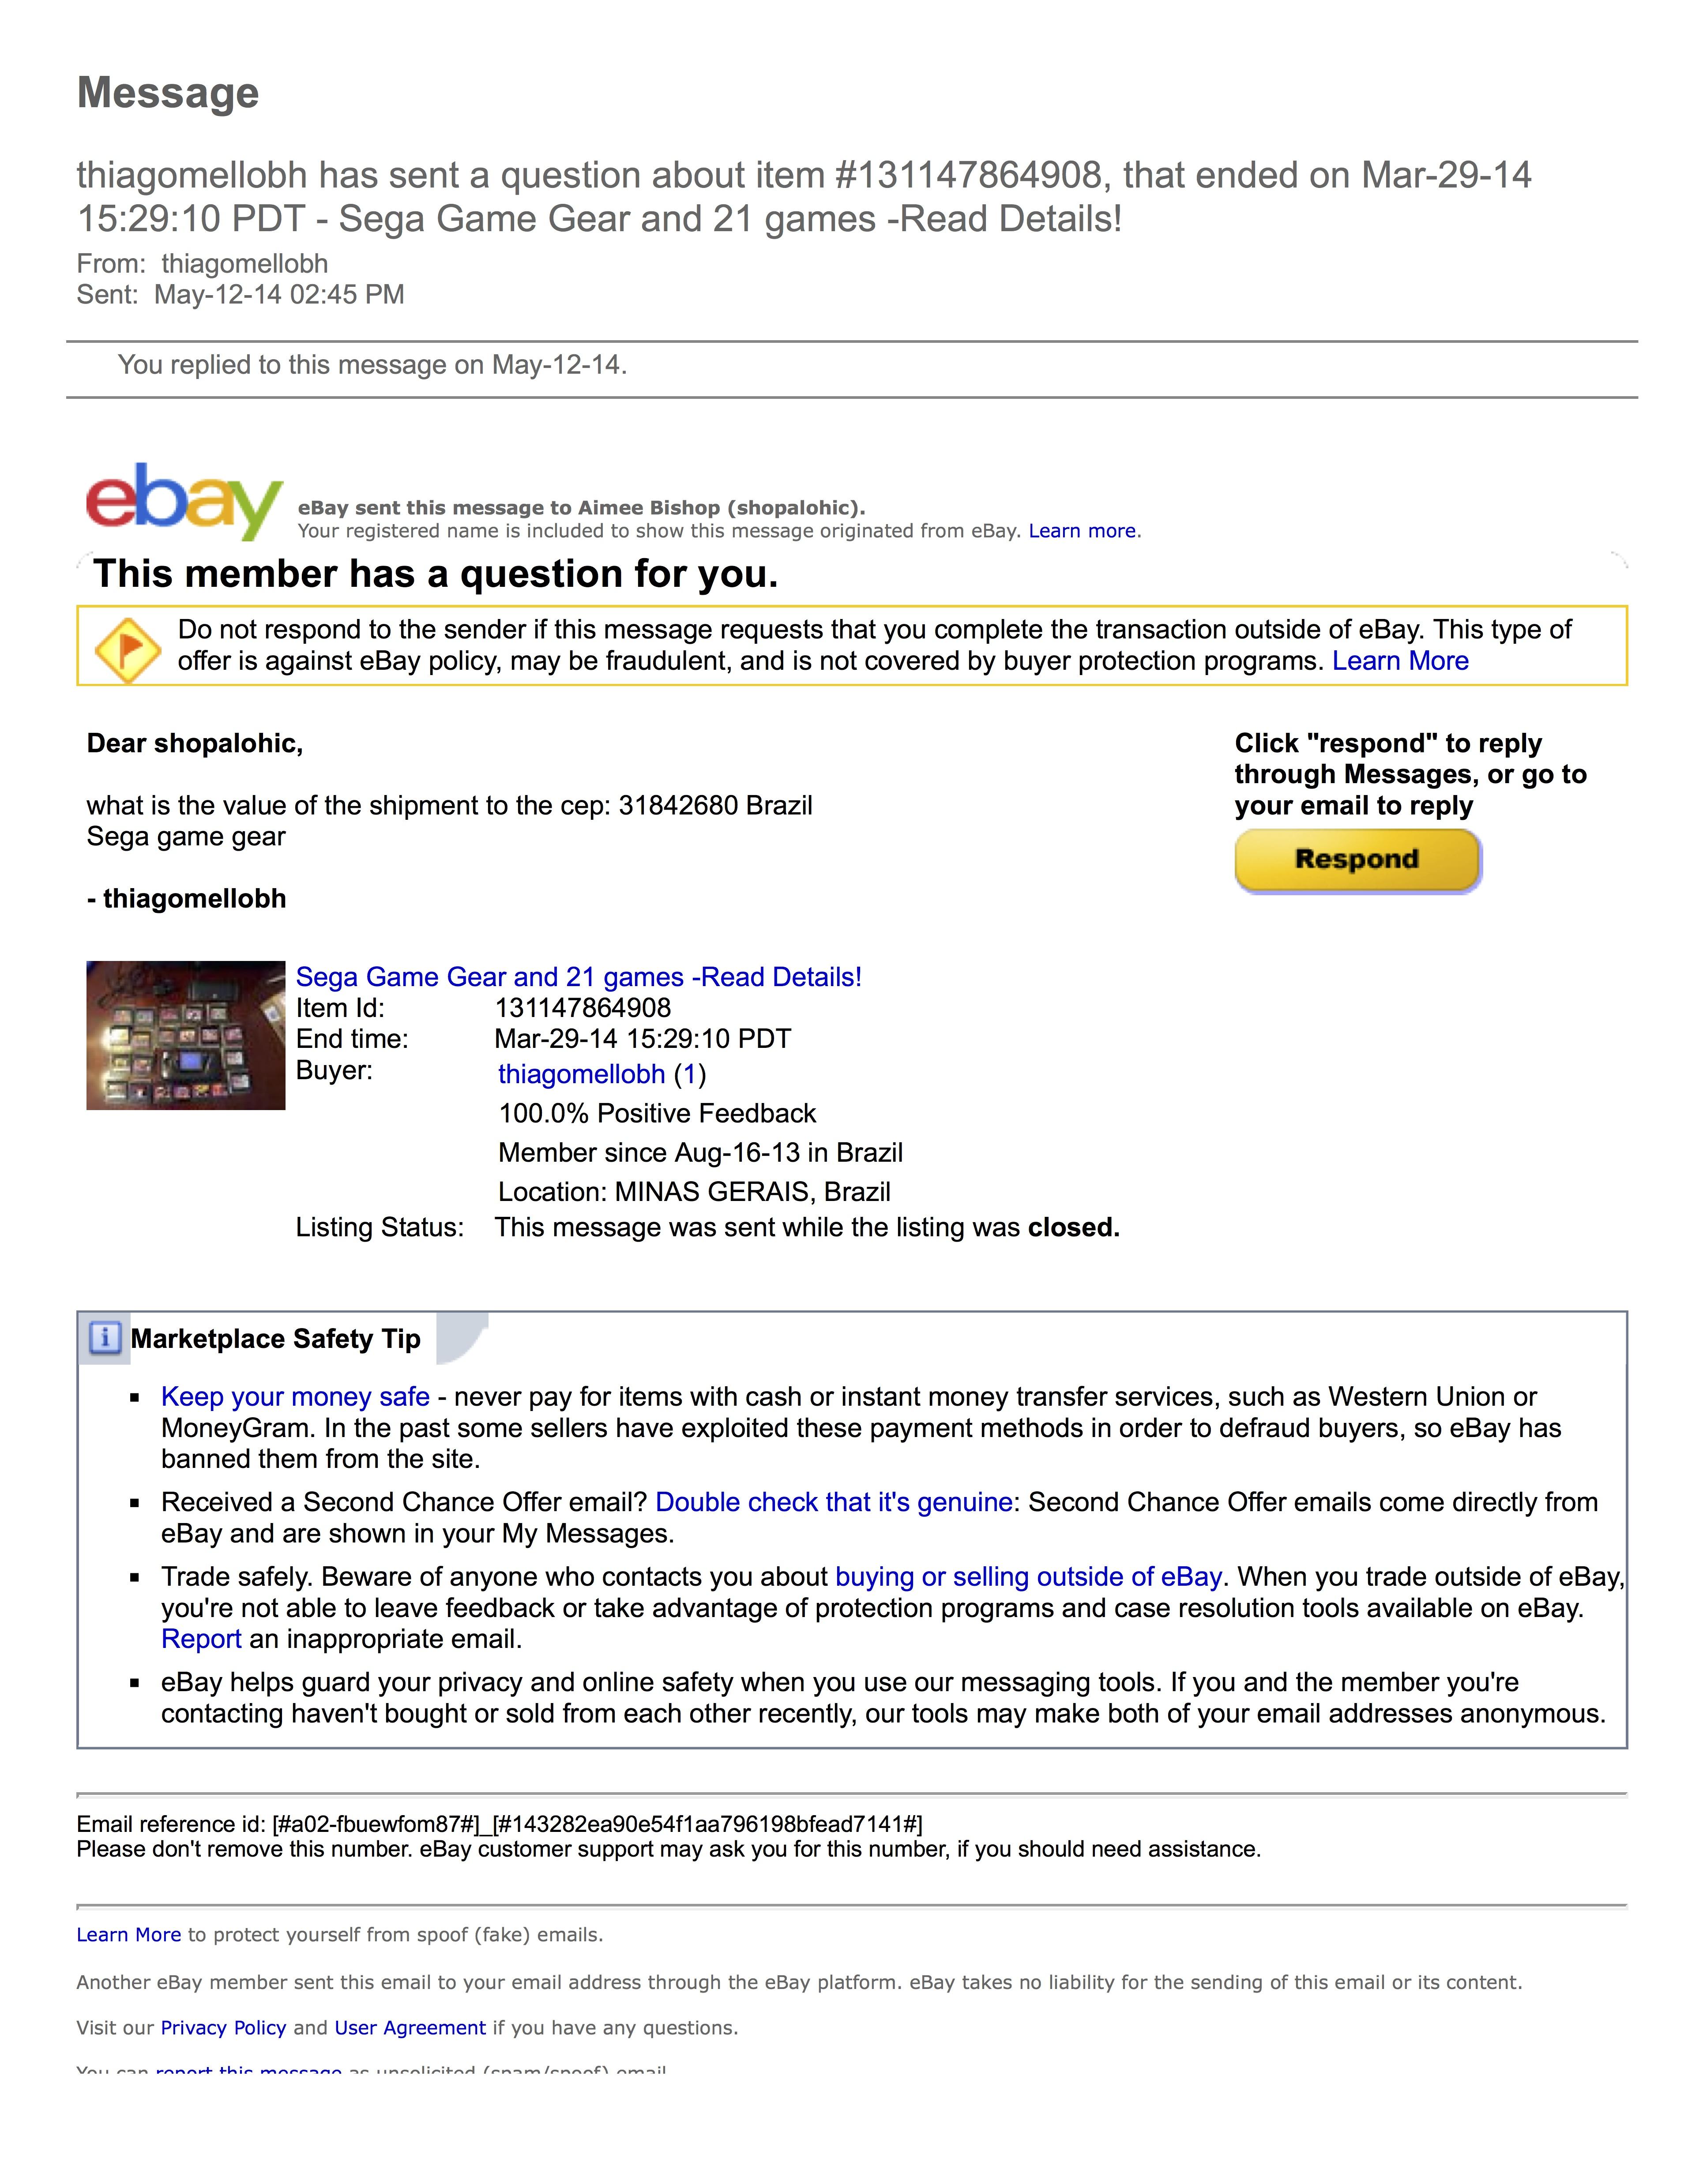 E-bay Yahoo on